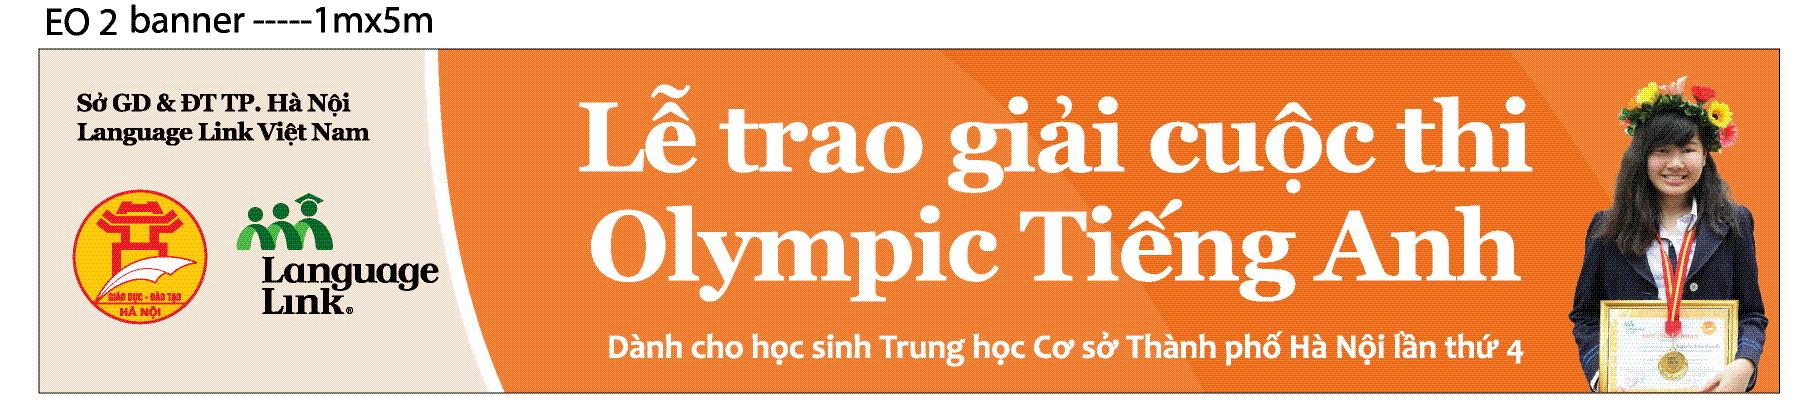 banner ngang (keo dai thanh 8m) in 2 ban_p2